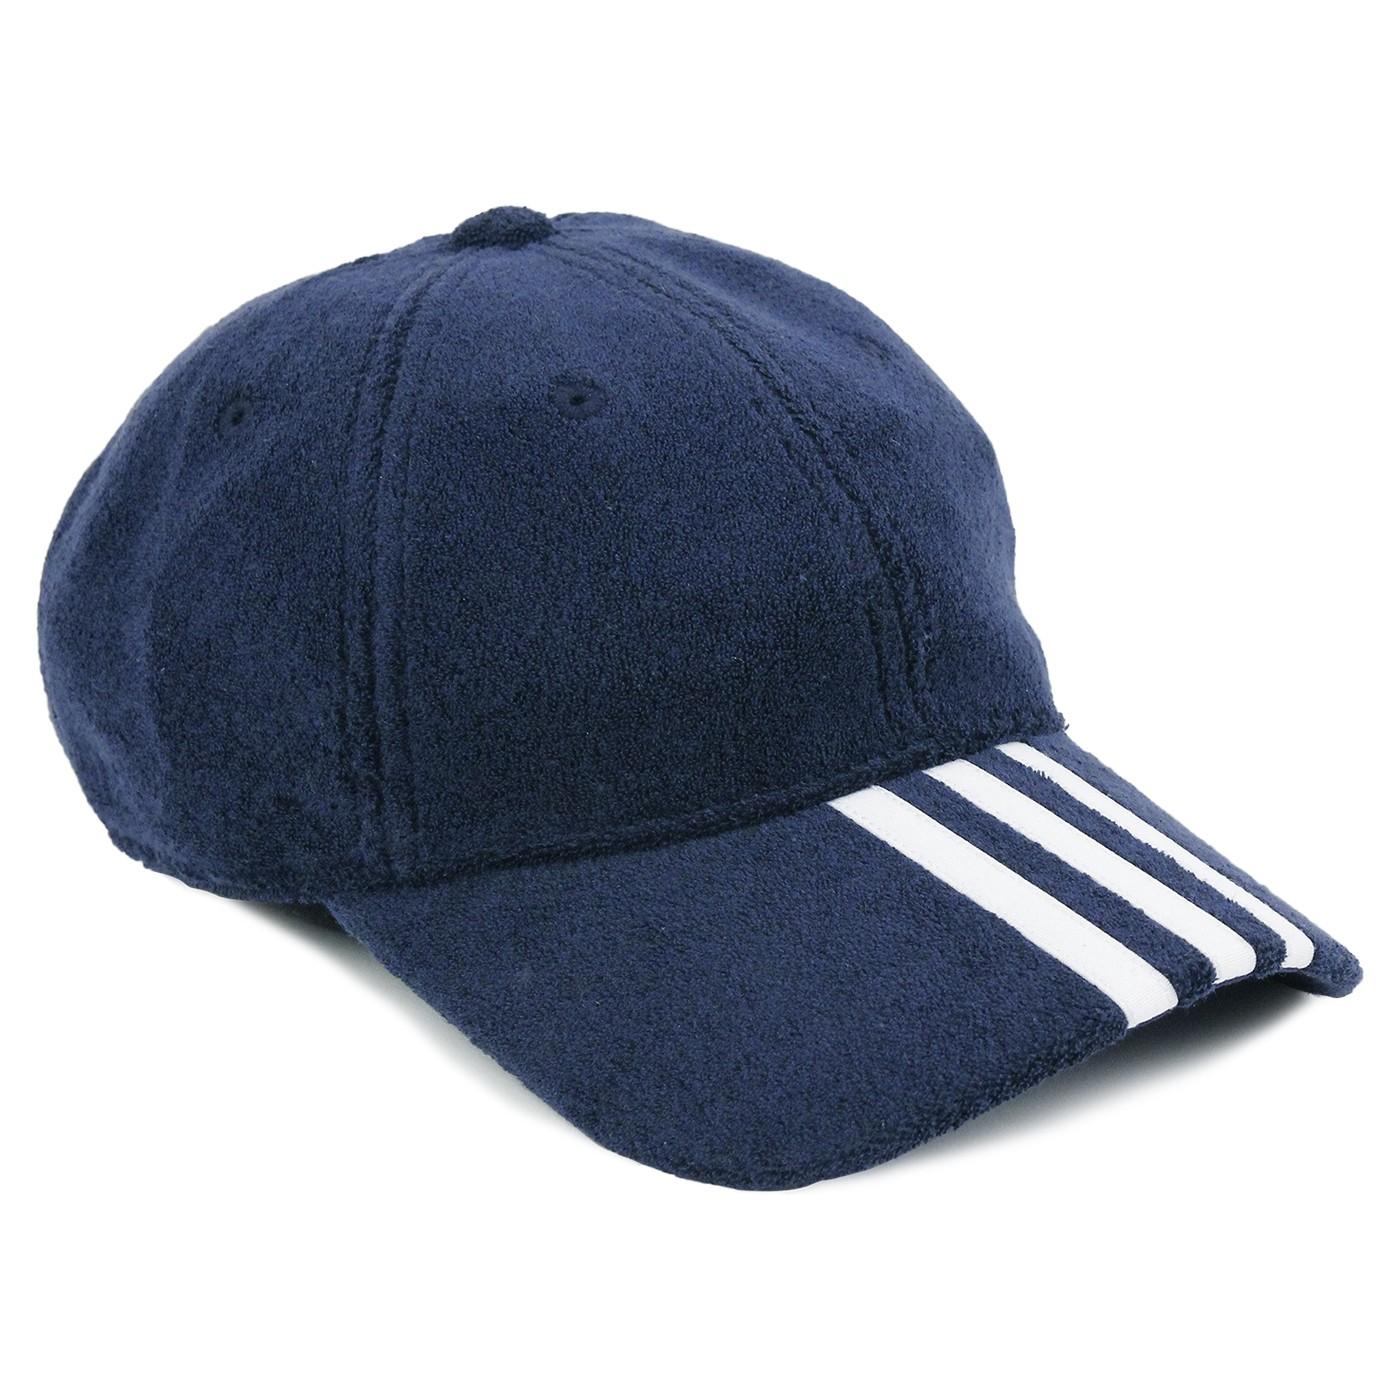 ff499c0266ef6 Adidas Adidas X Palace Towel Cap